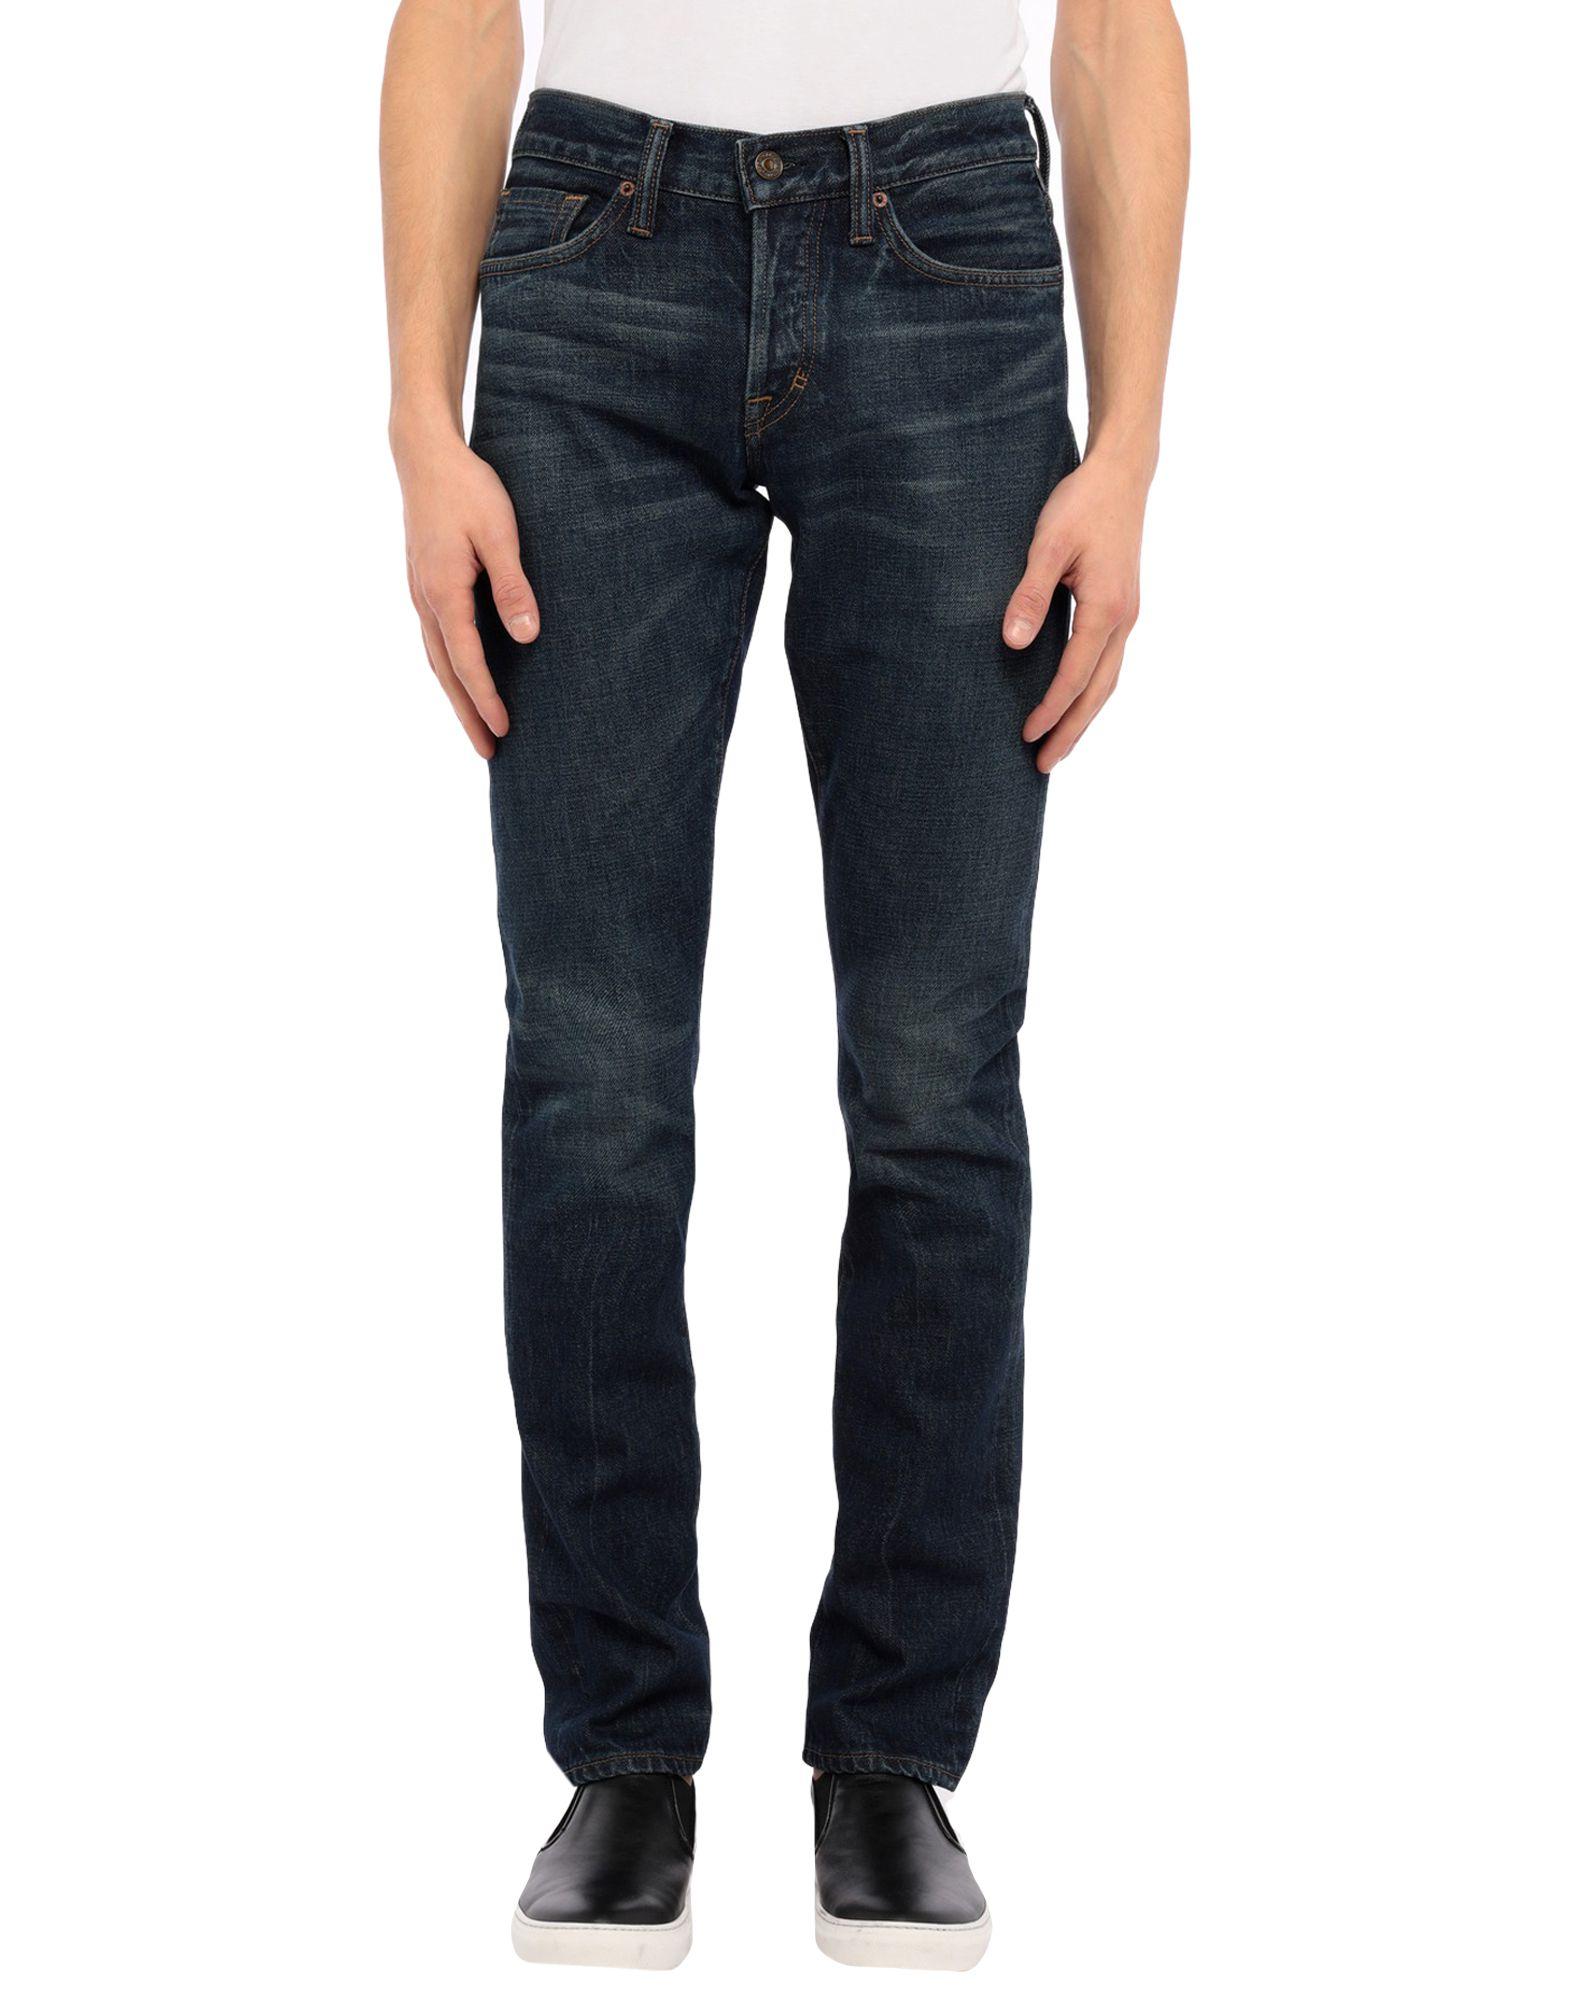 TOM FORD Denim pants - Item 42775306